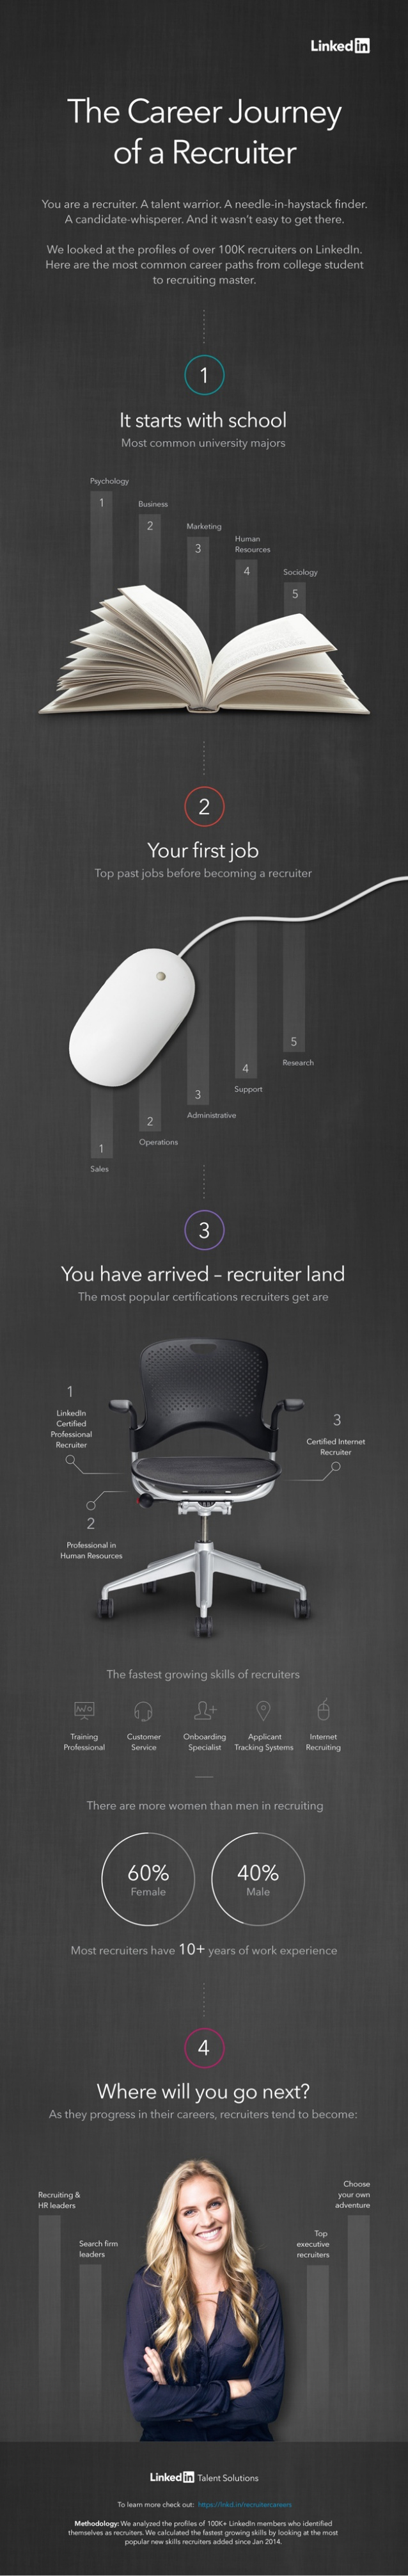 Cómo llegar a ser reclutador